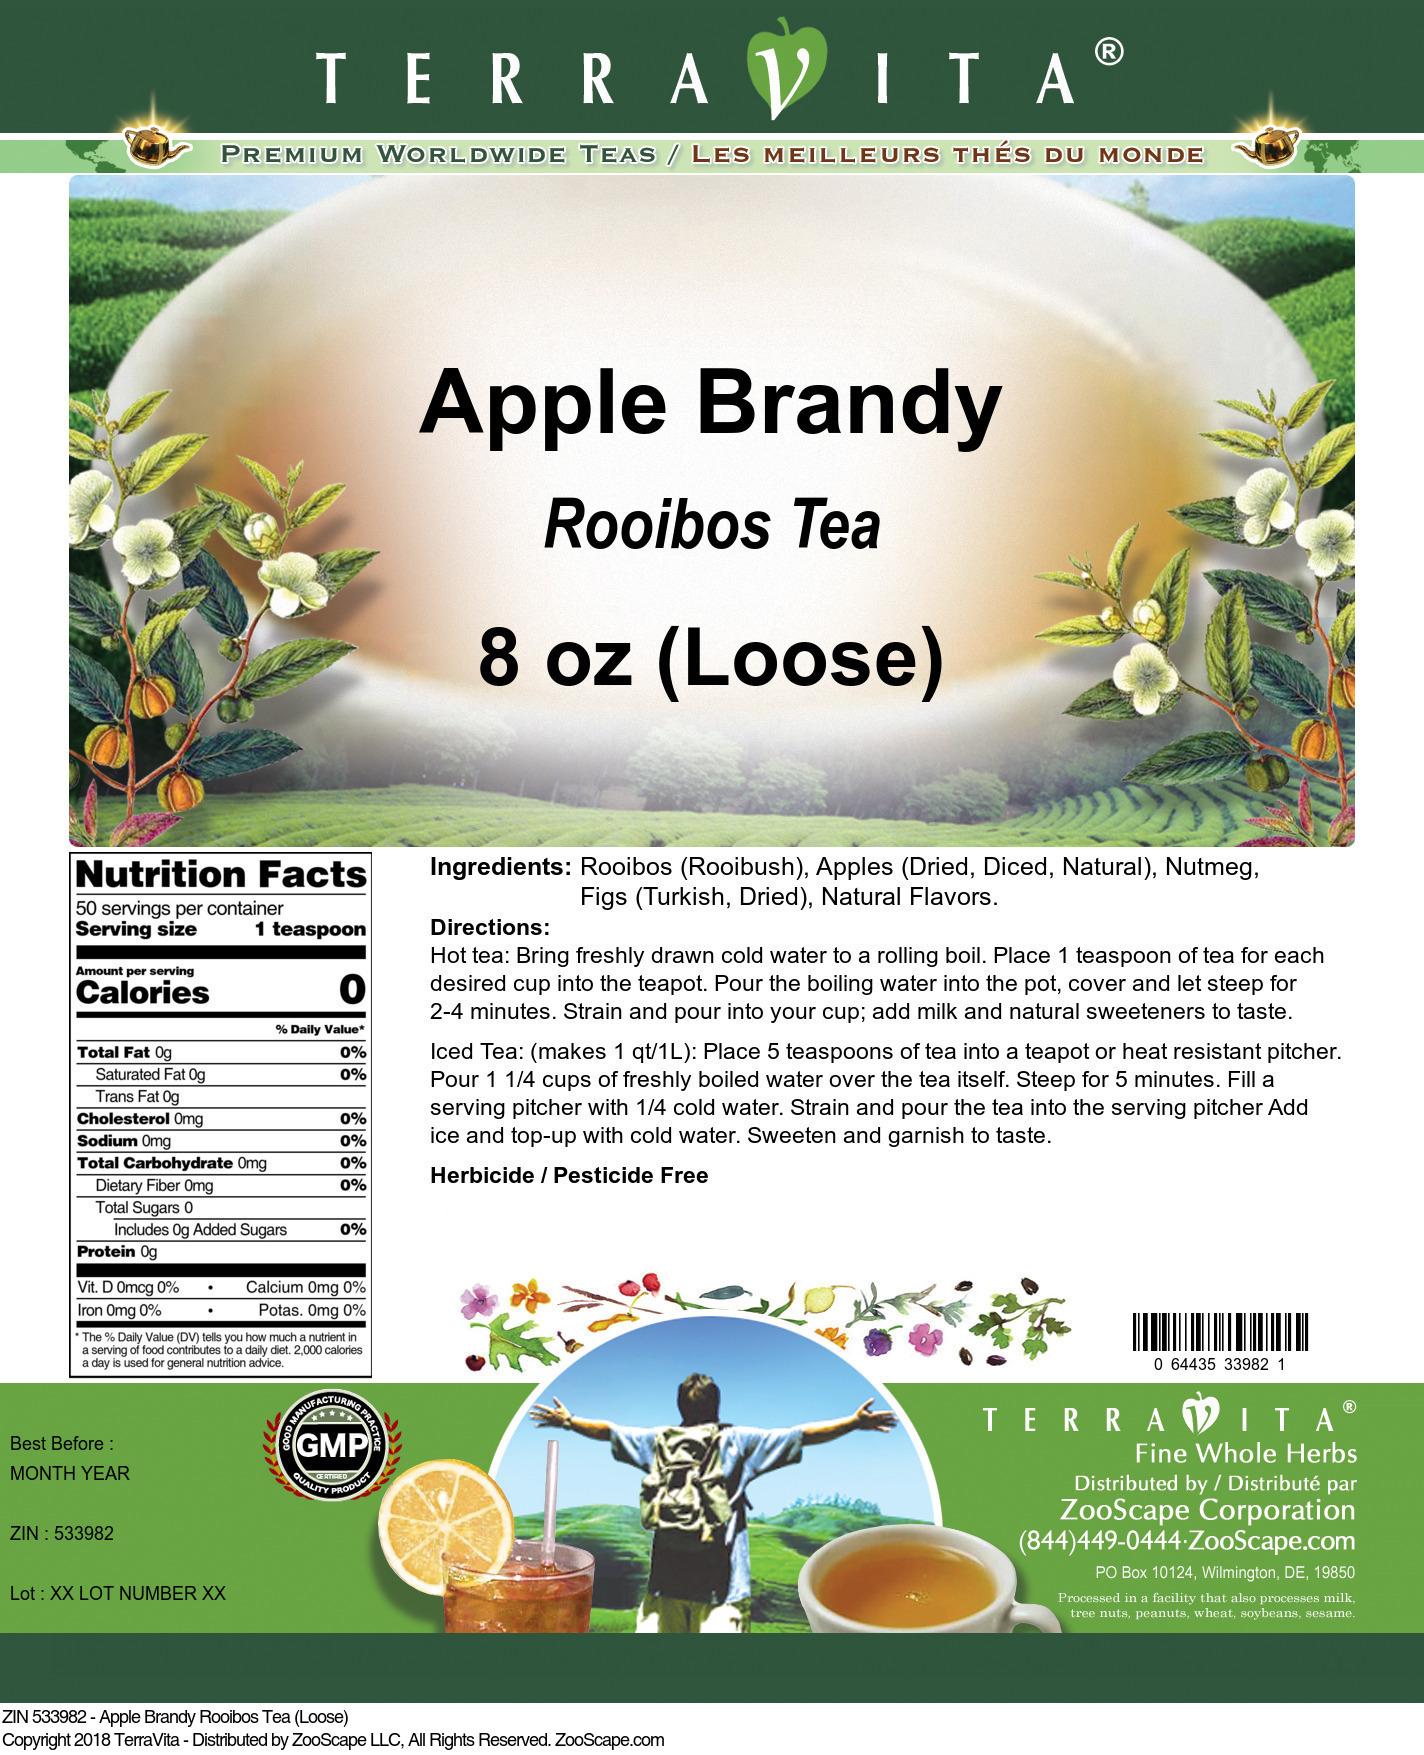 Apple Brandy Rooibos Tea (Loose)